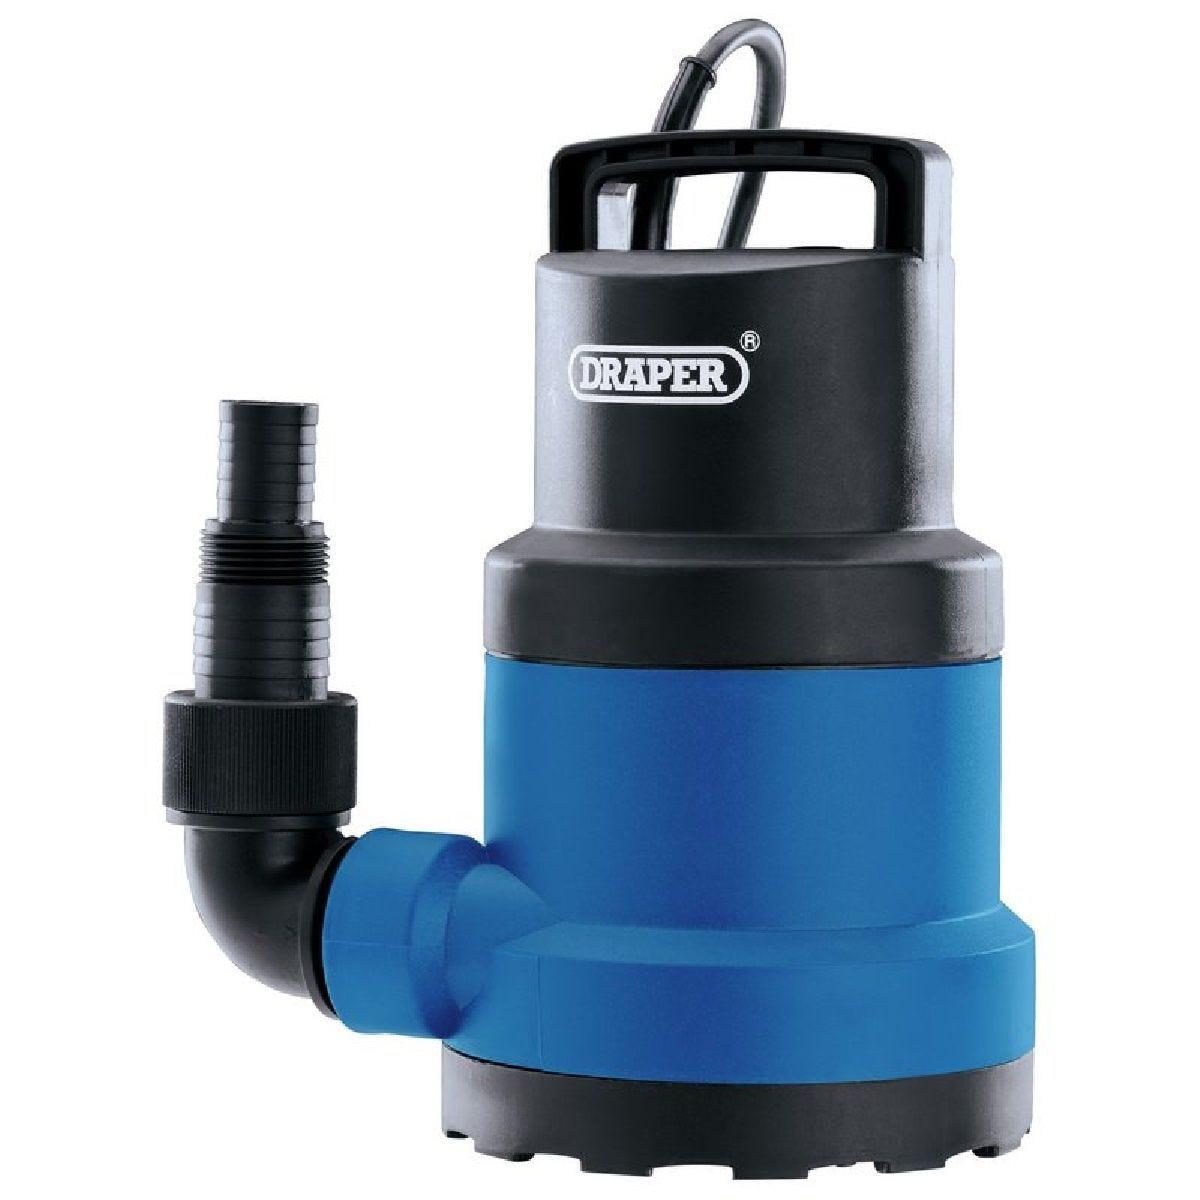 Draper Submersible Water Pump - 250W